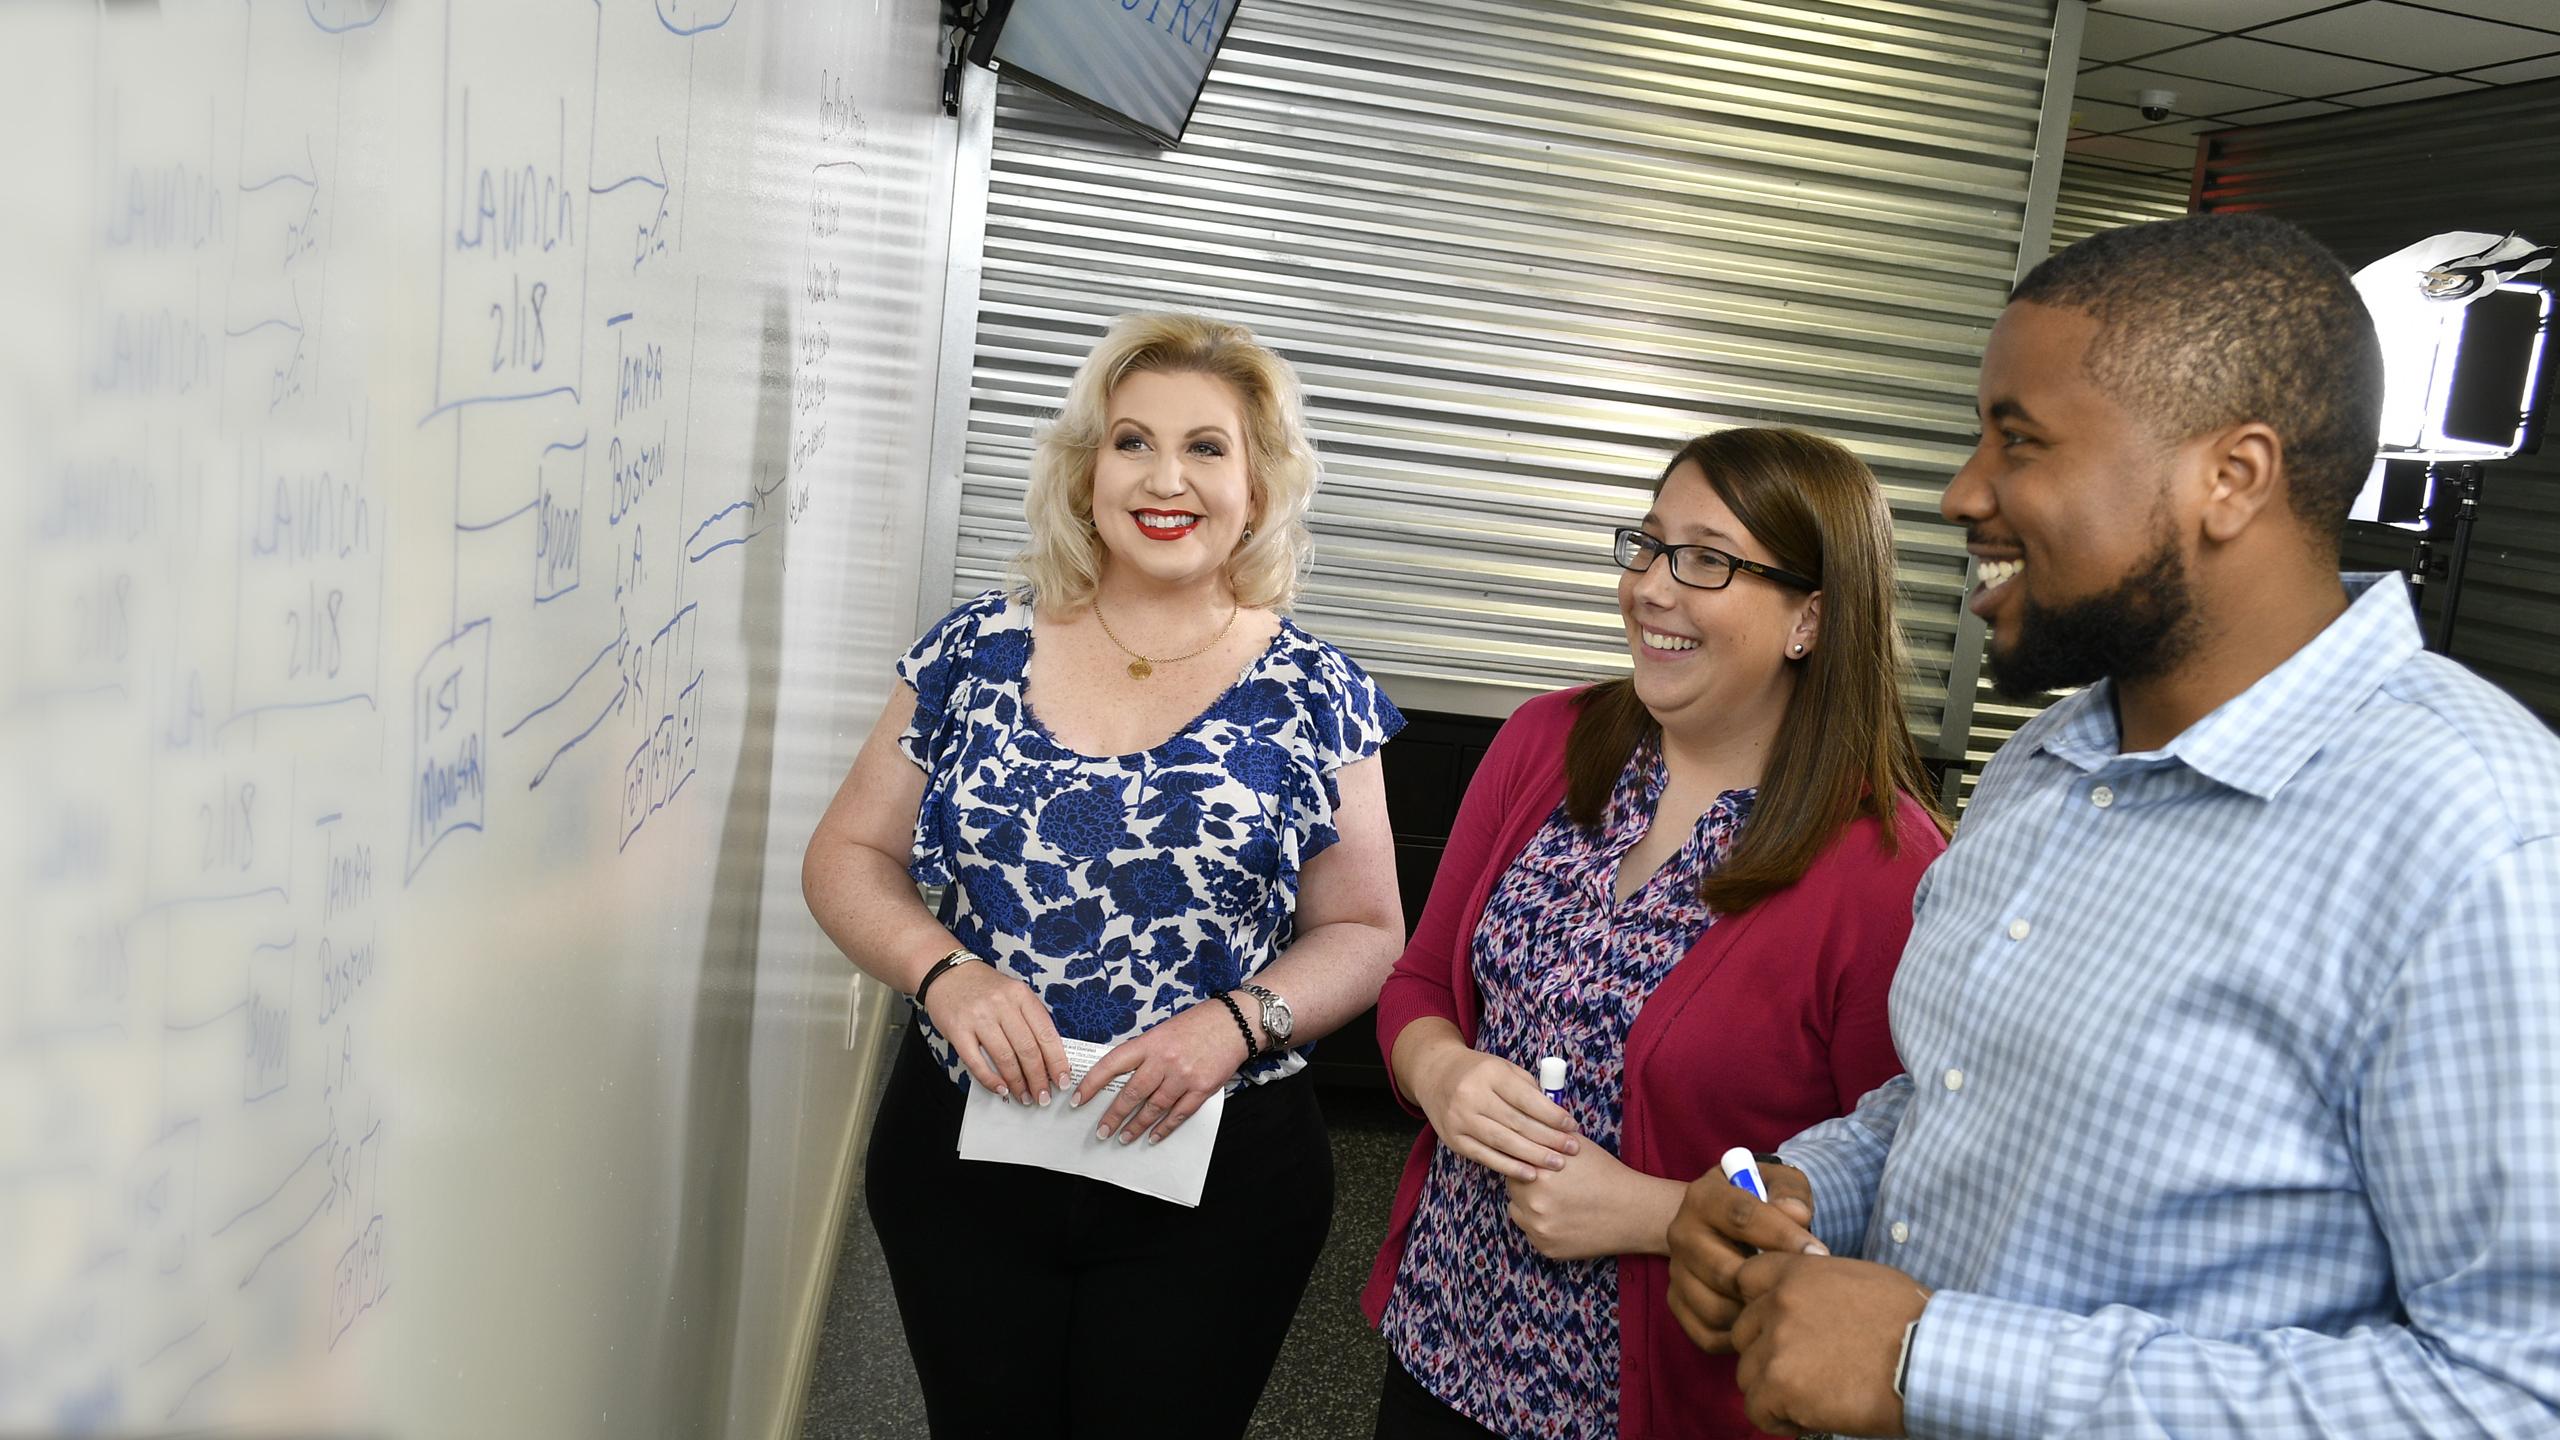 Team members strategizing at the whiteboard.